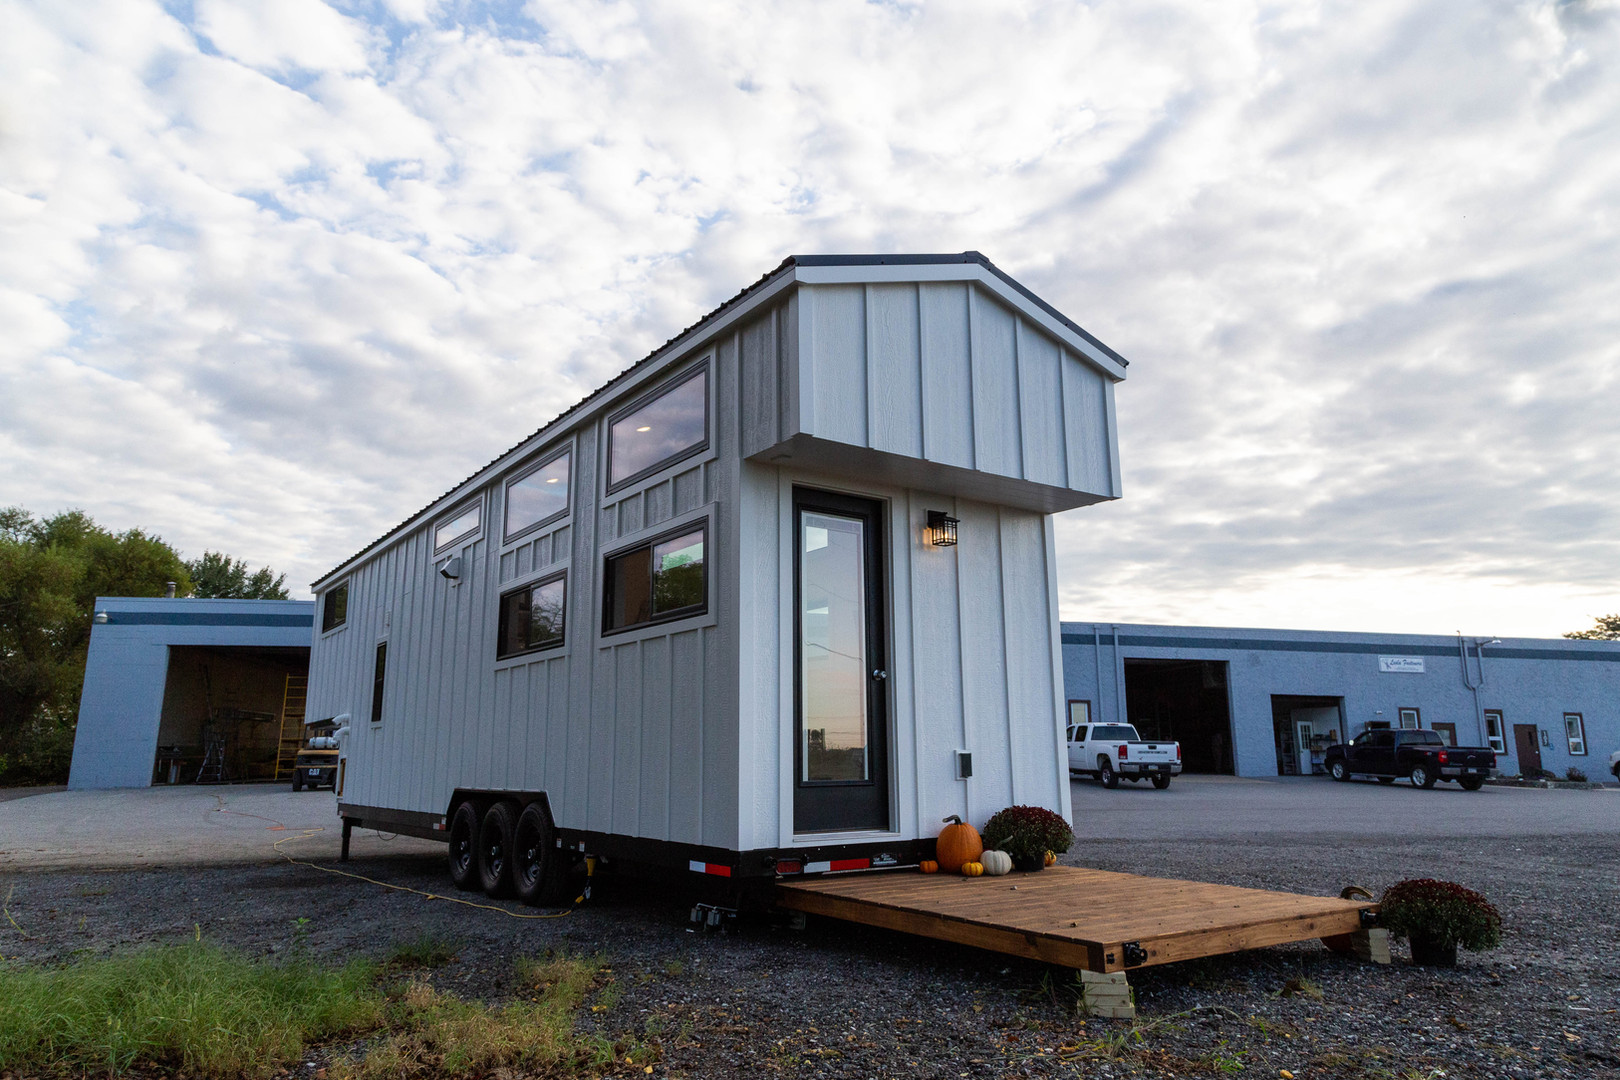 Gooseneck Tiny House on Wheels